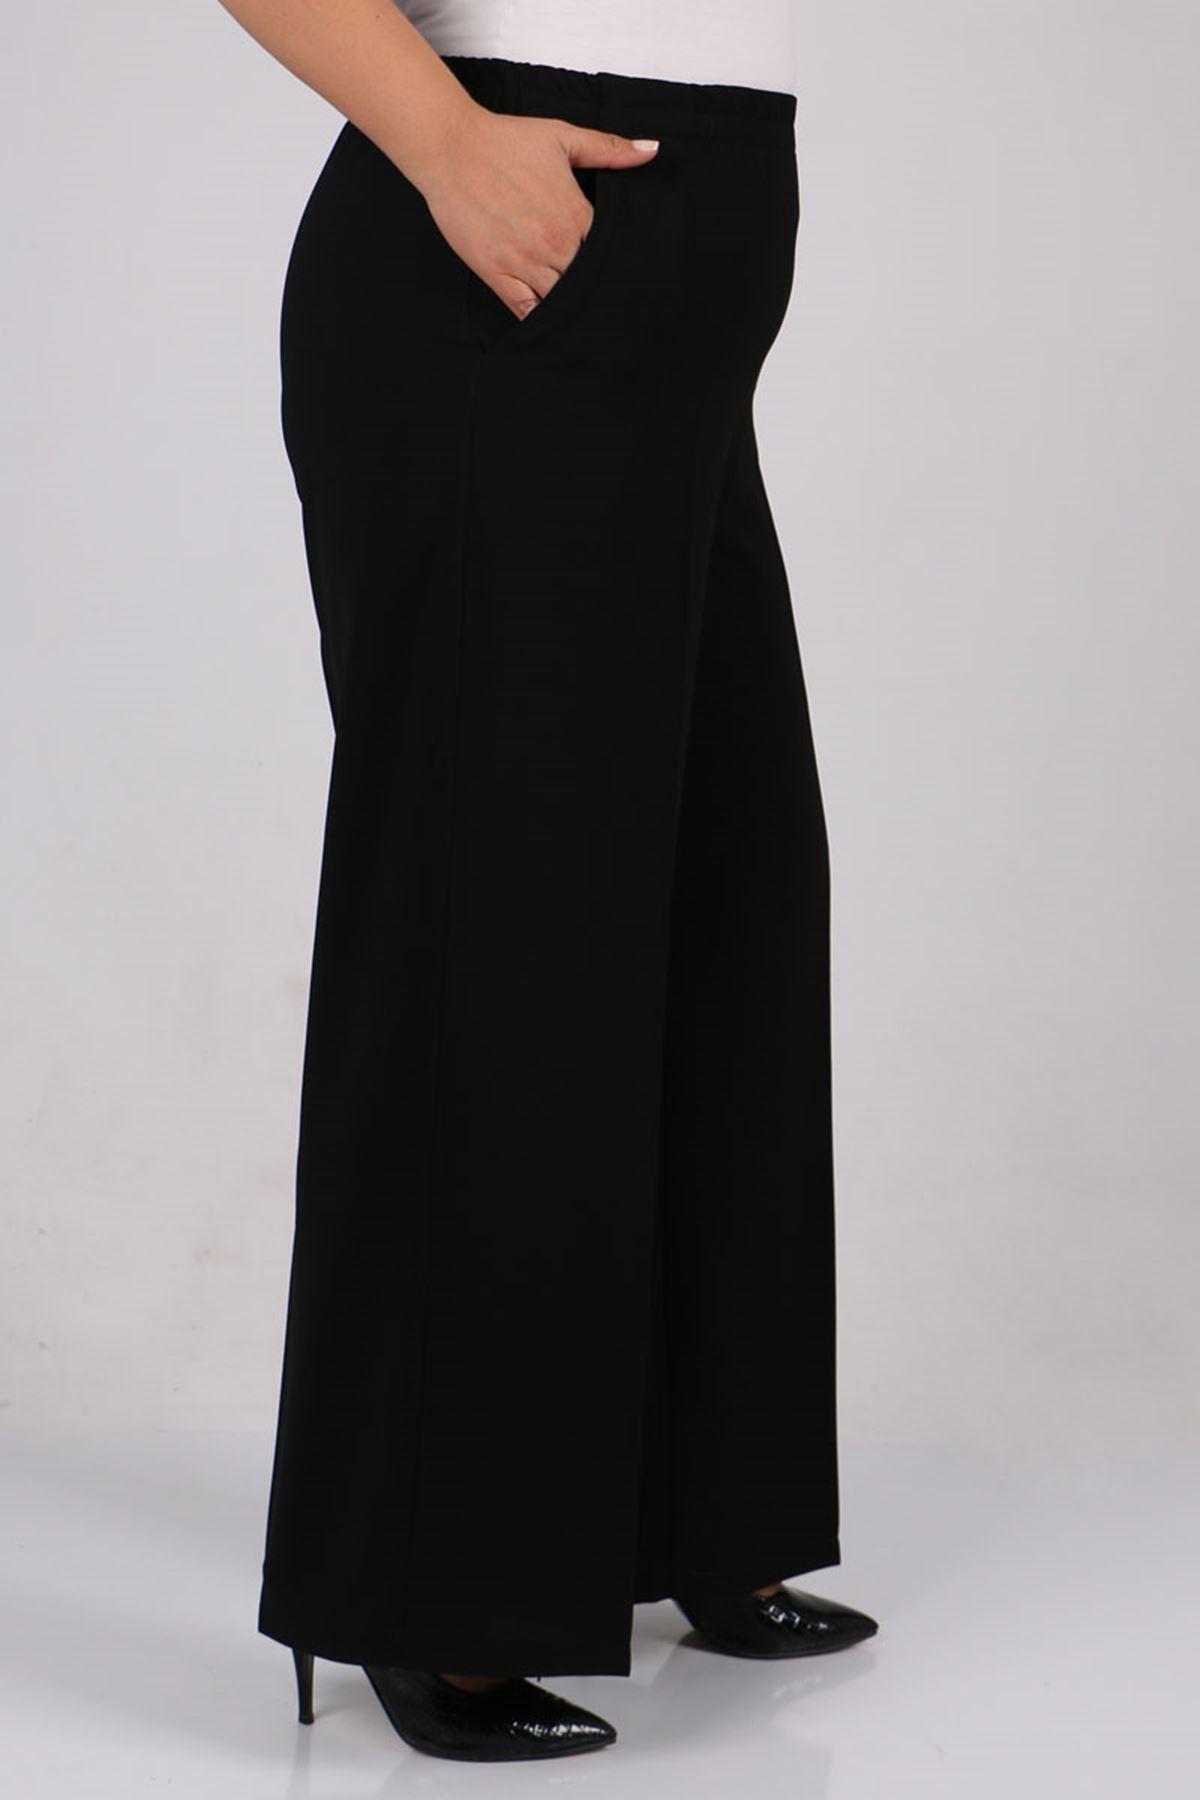 9171 Büyük Beden Beli Lastikli Çift Kat Krep Pantolon - Siyah